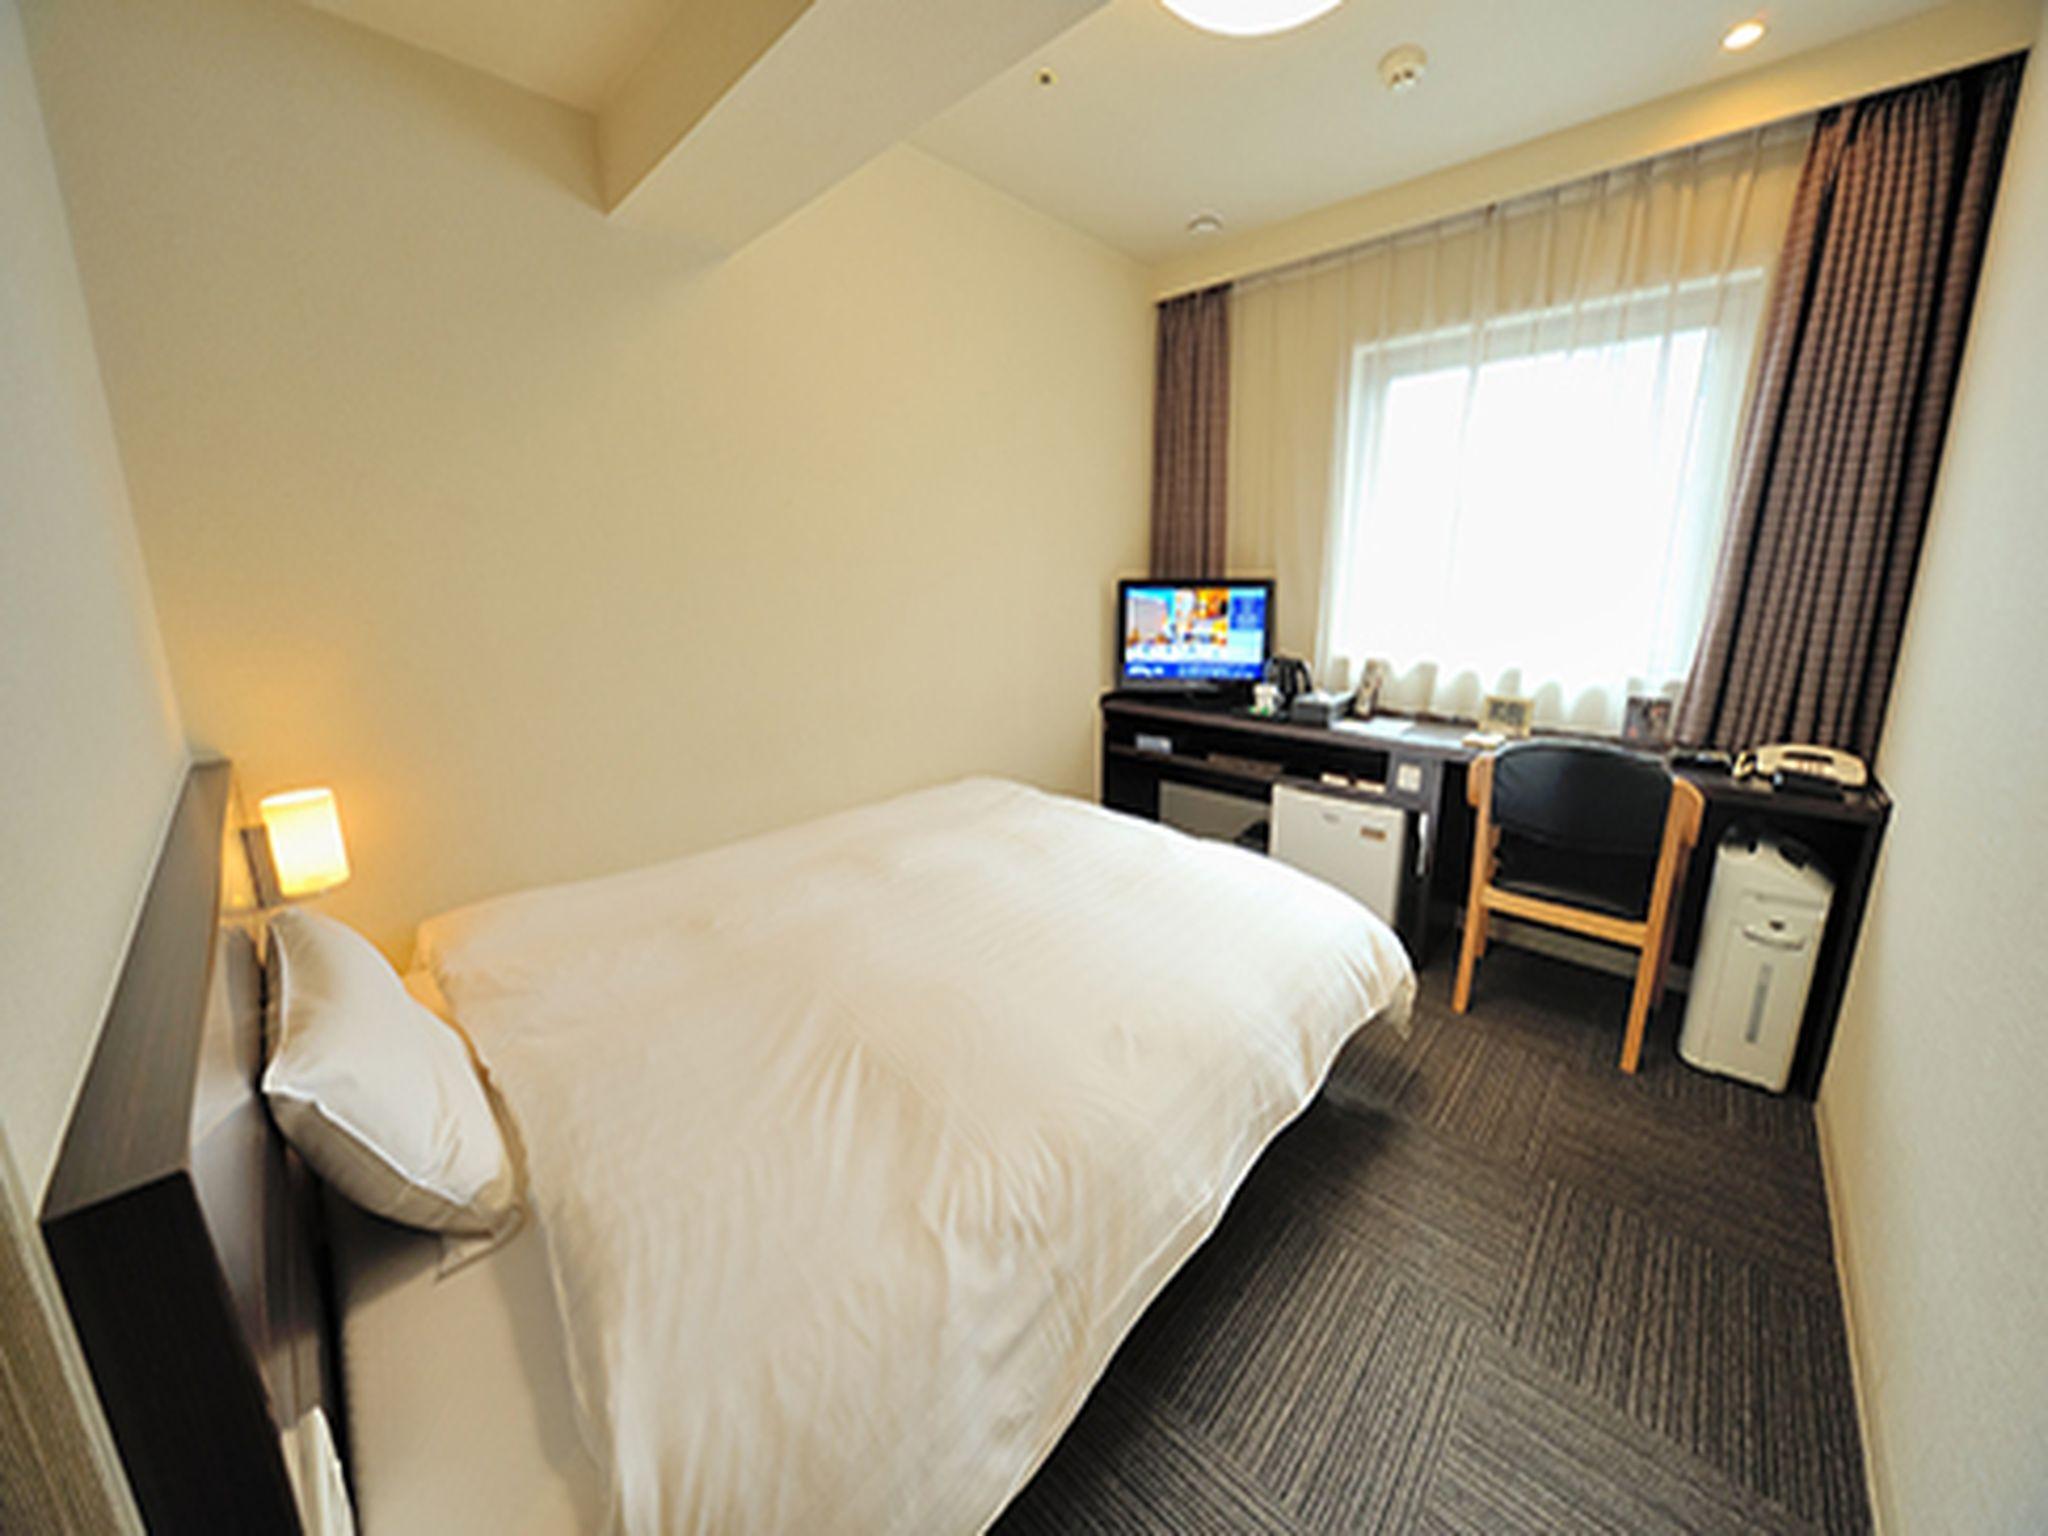 Hotel Carpe Diem Sailing Cruises - Sanur Bali 82218 Indonesia - Bali